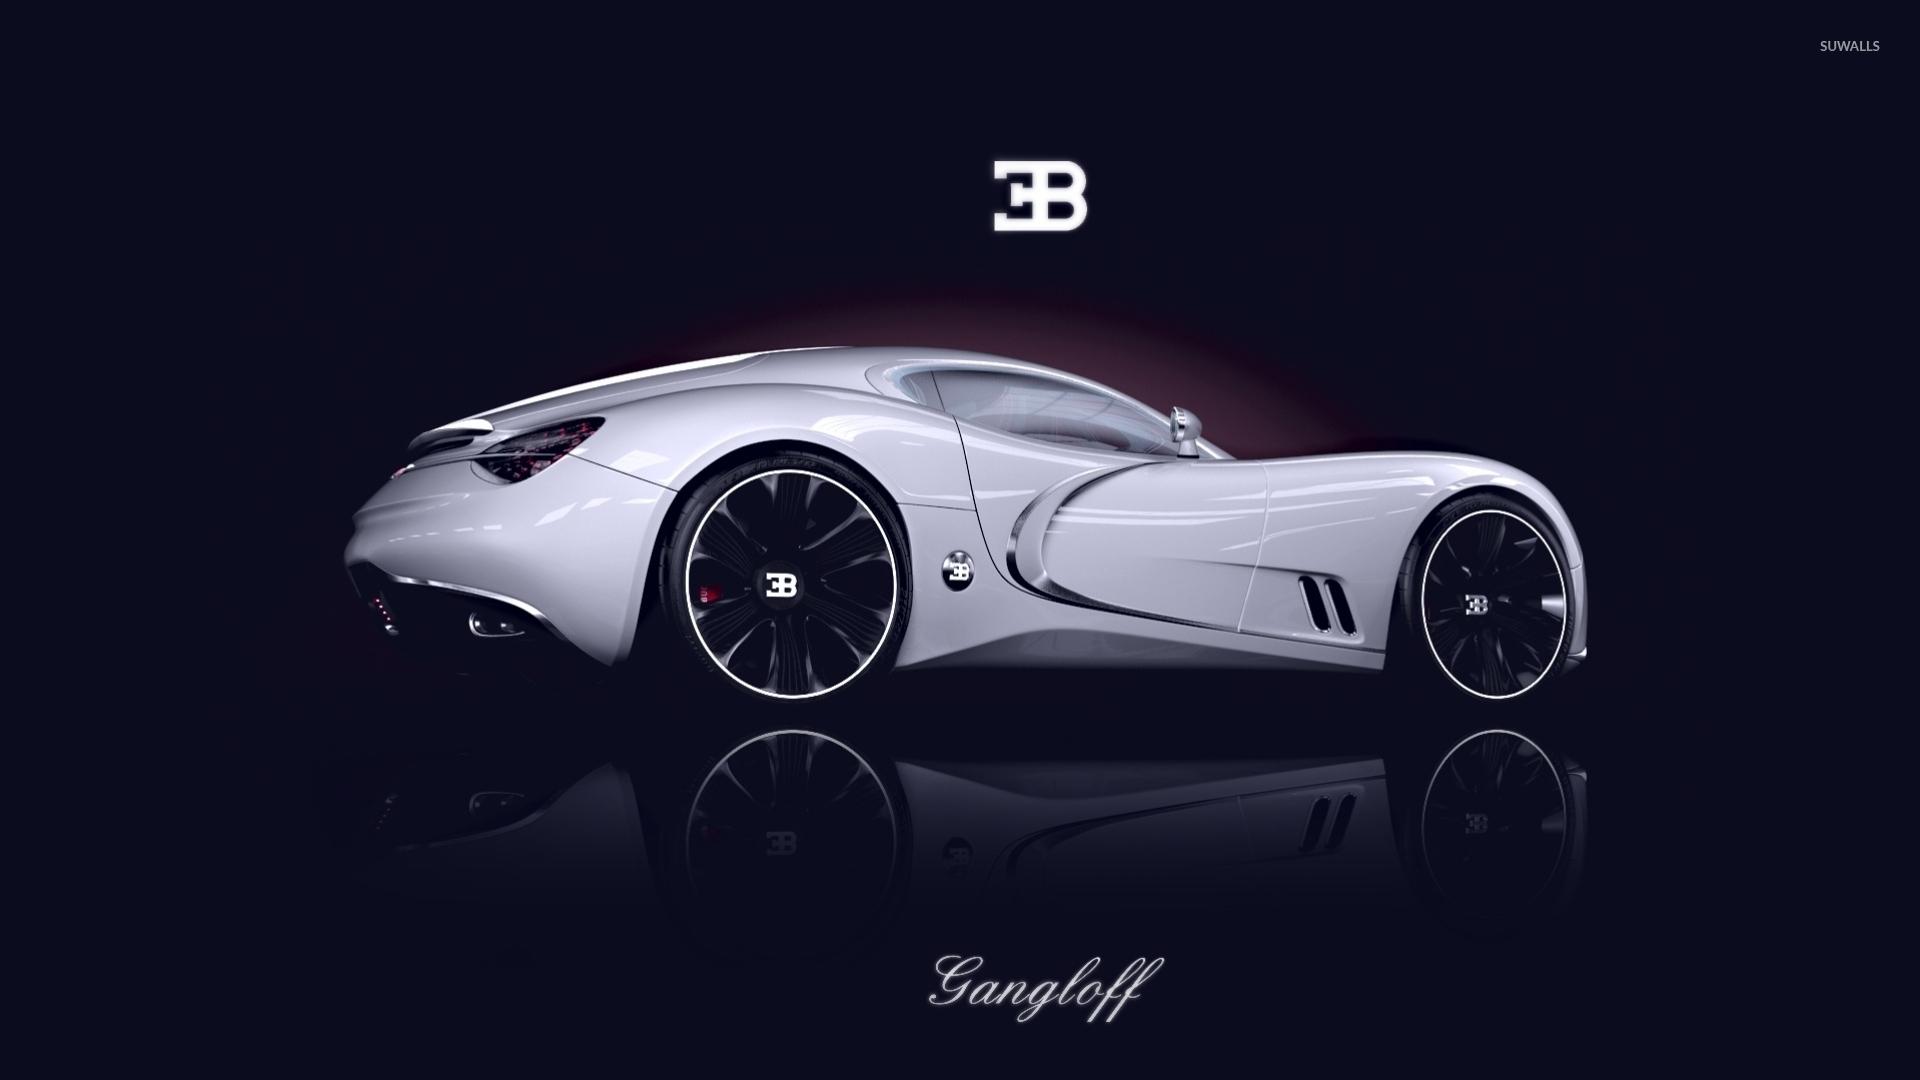 Side View Of A White Bugatti Gangloff Wallpaper Car Wallpapers 52428